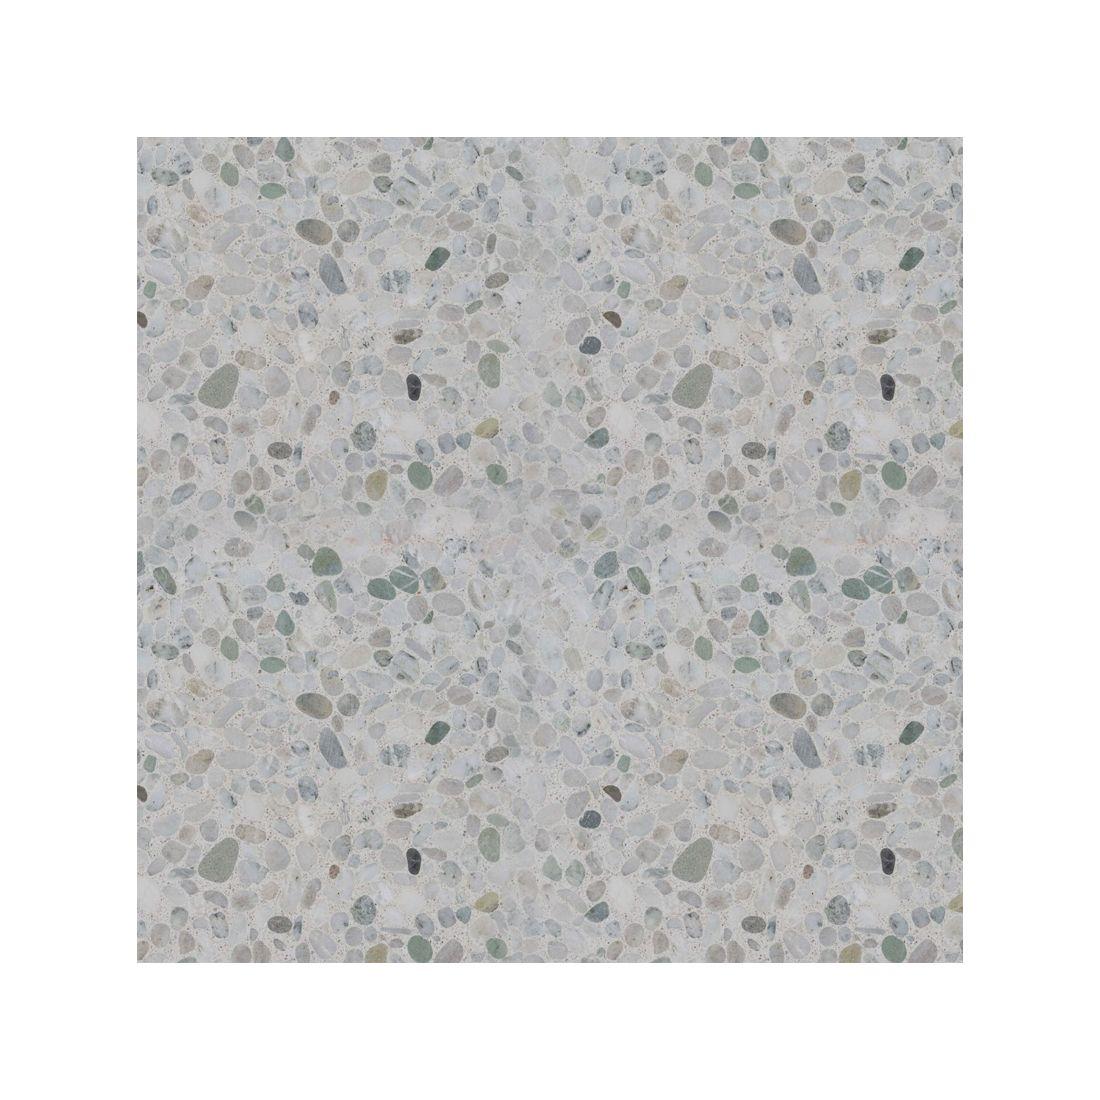 Terrazzo Honed Paver Arctic 600 x 600 x 40mm